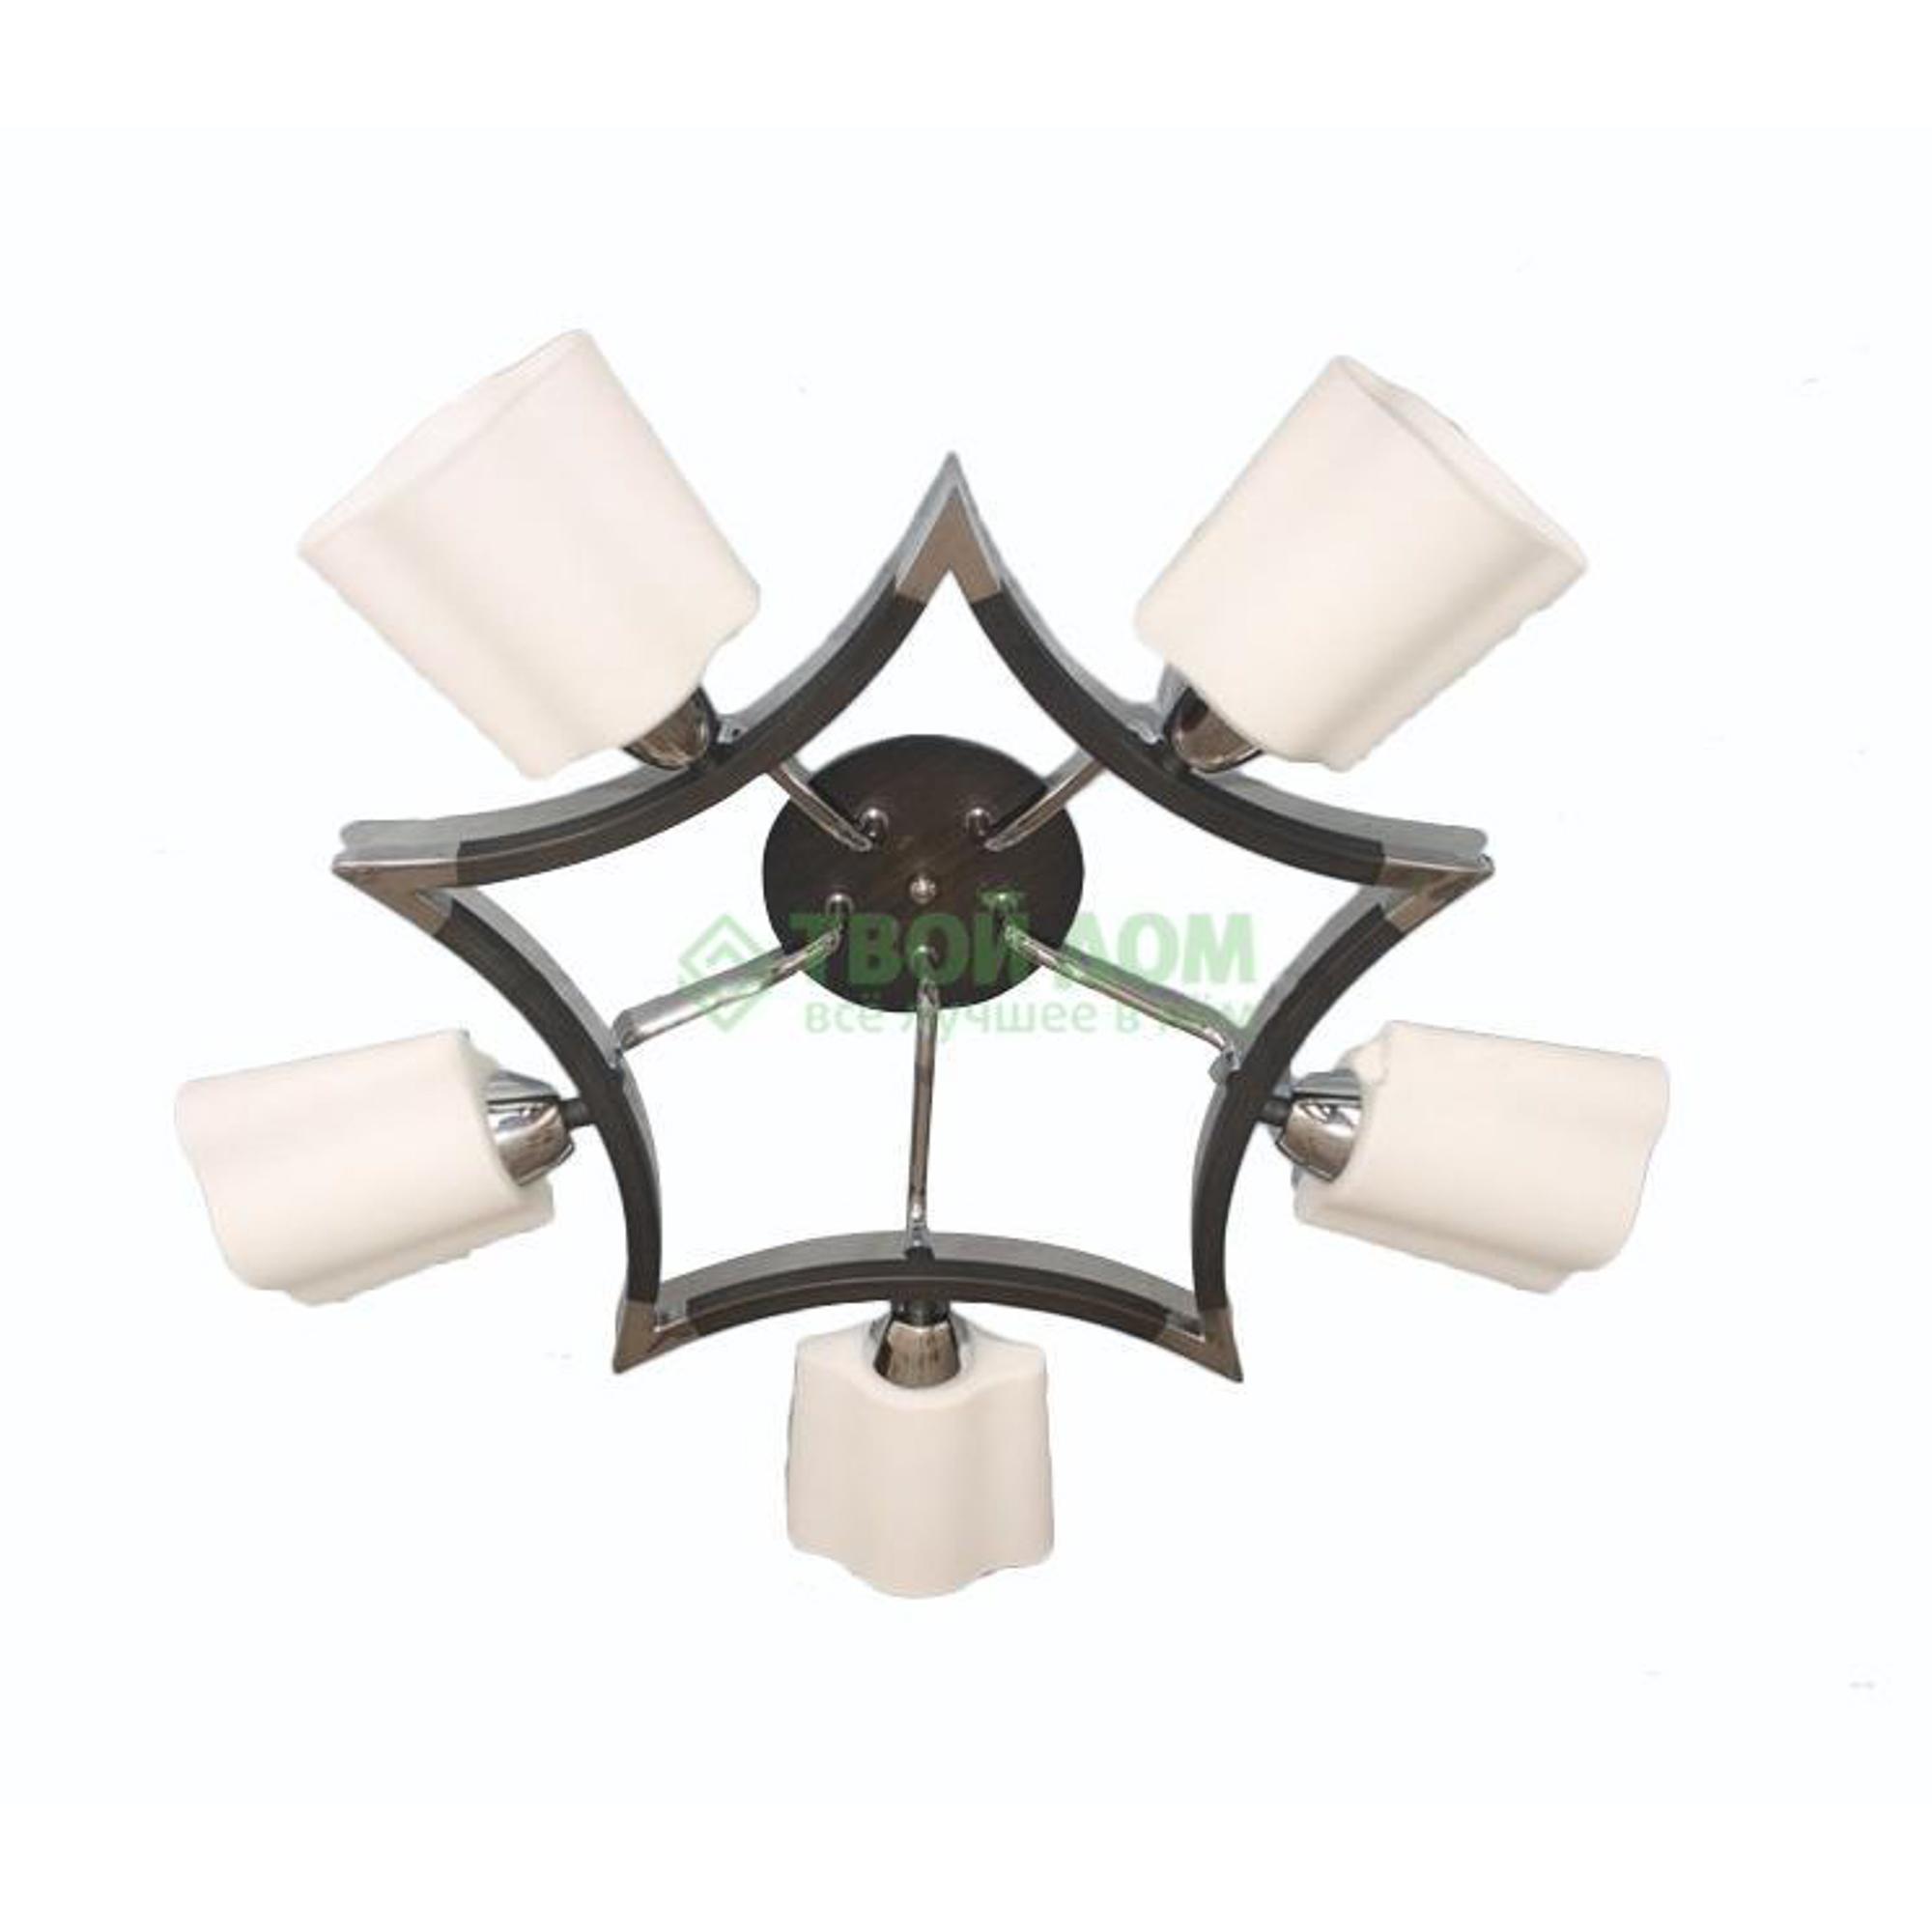 Люстра потолочная Mb-light mb30723/5 (MB30723/5)